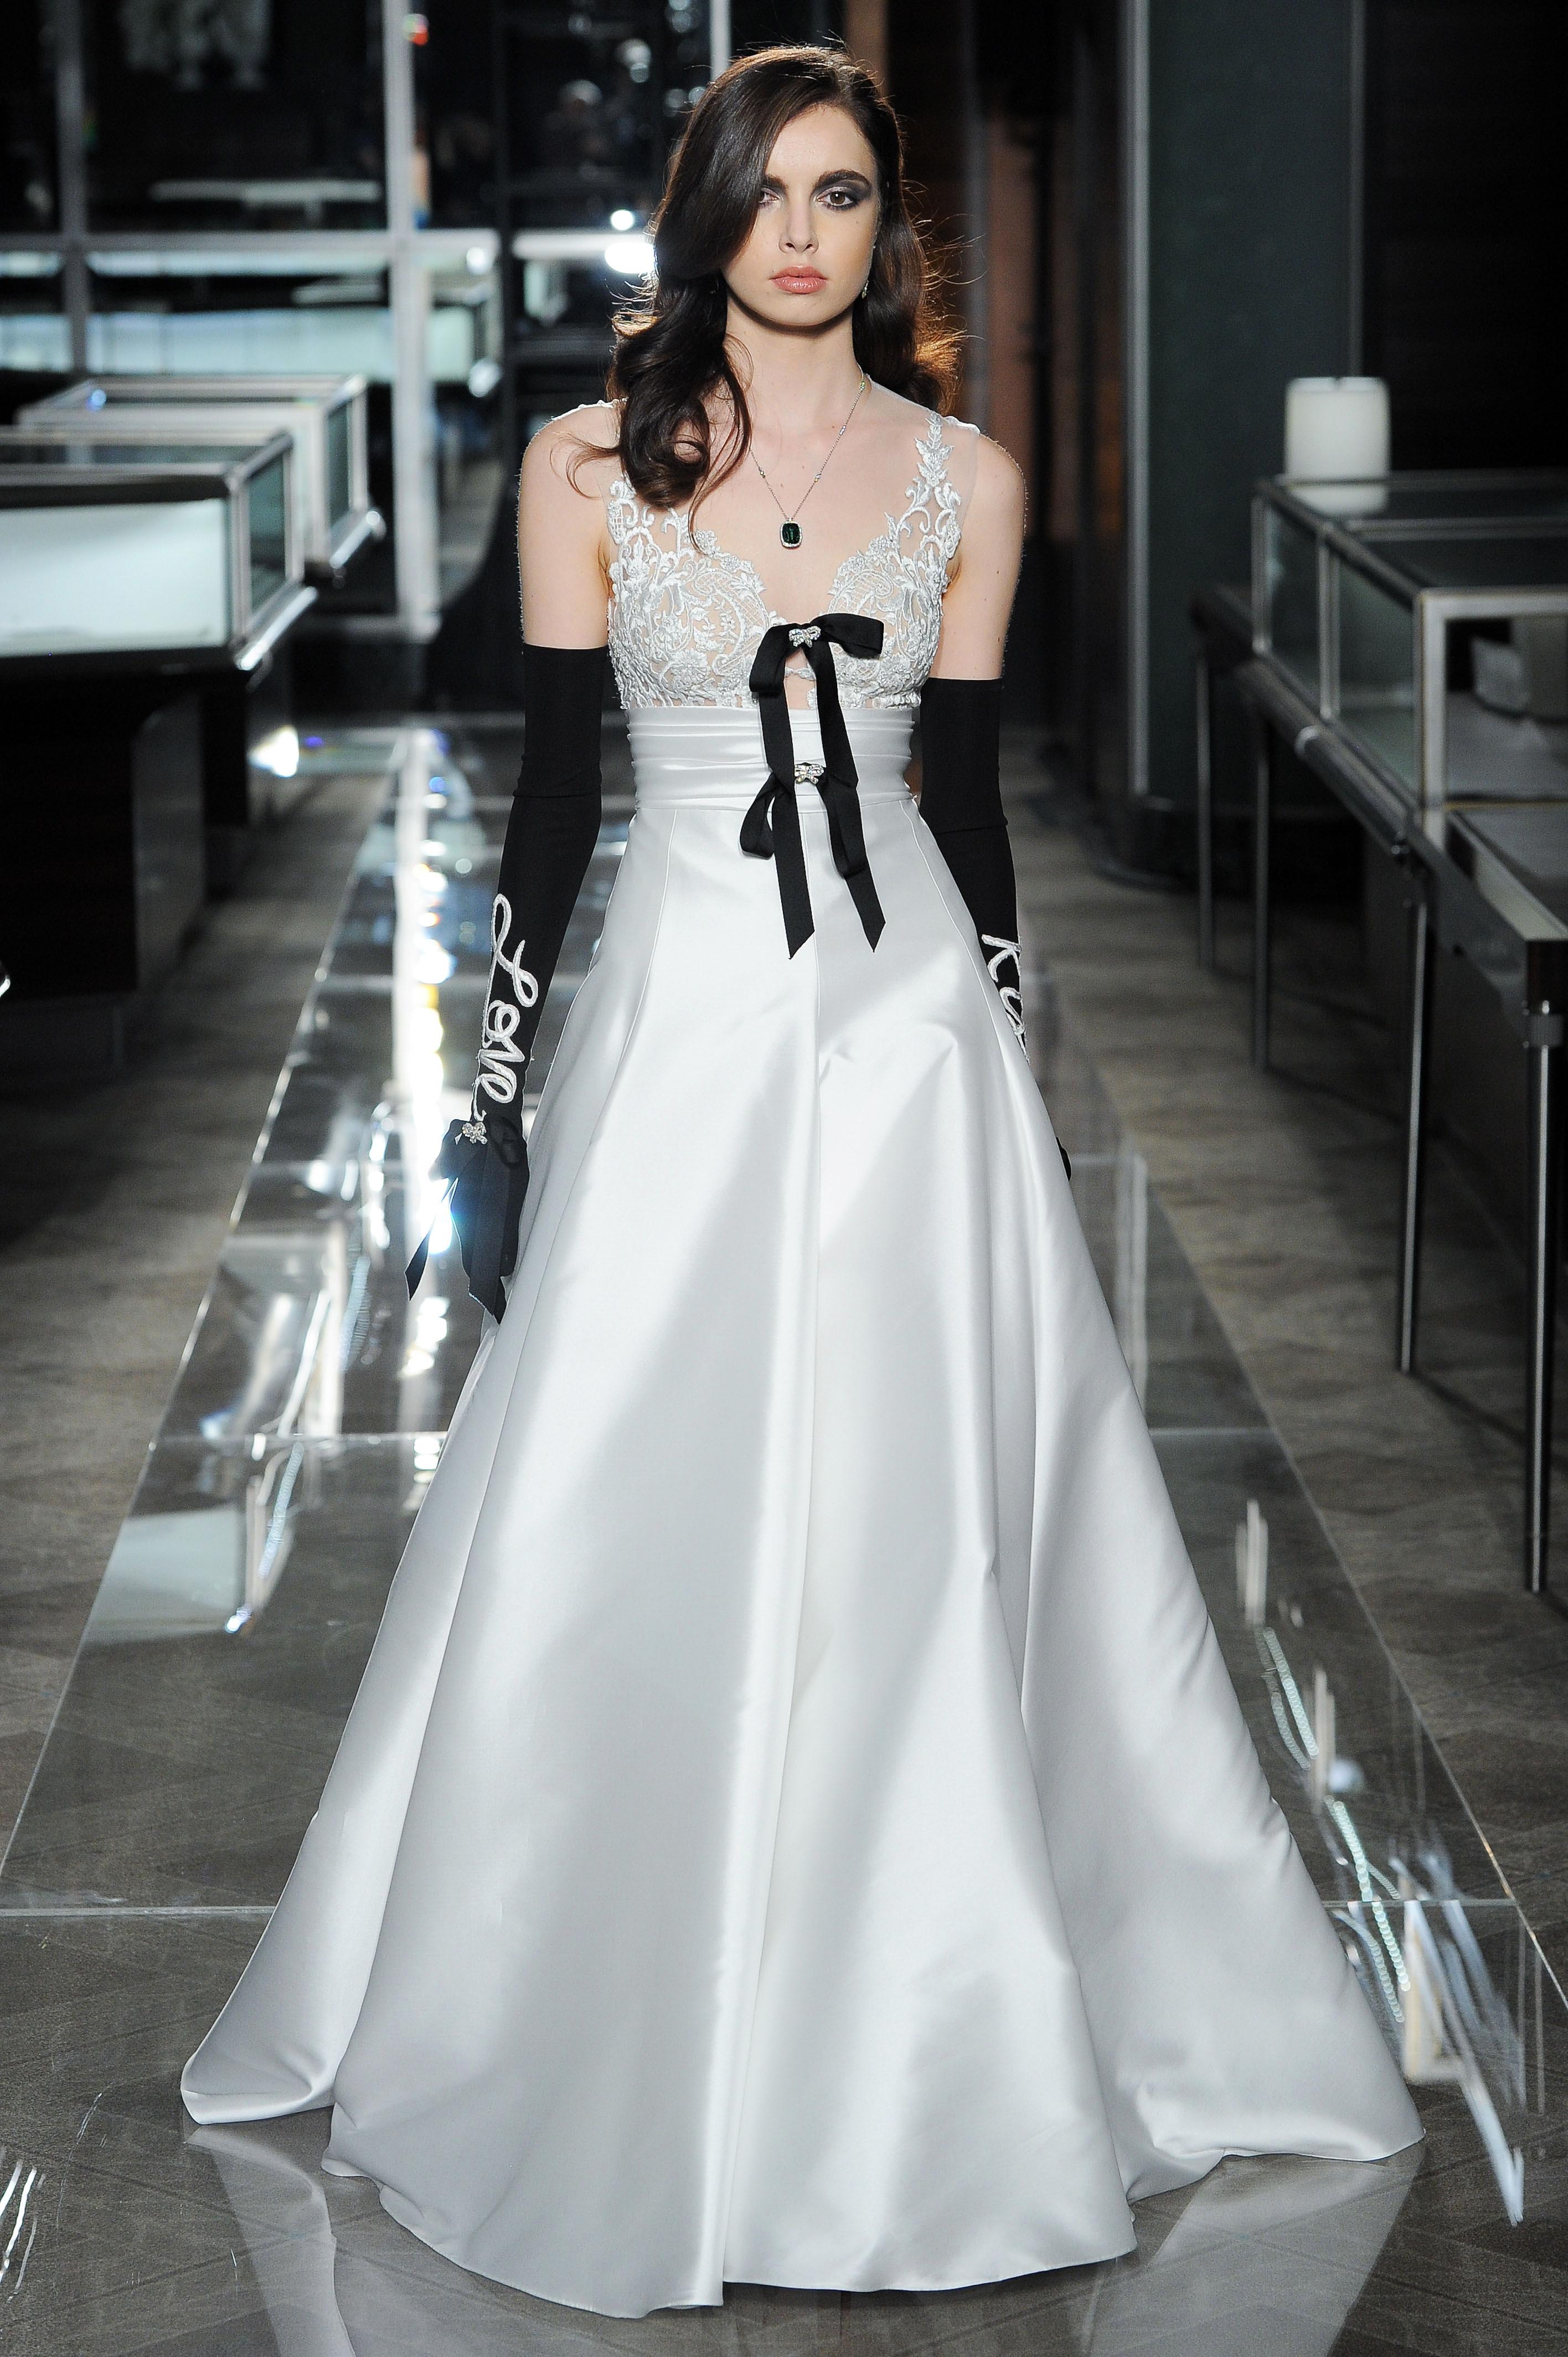 reem acra spring 2018 a-line wedding dress with black gloves